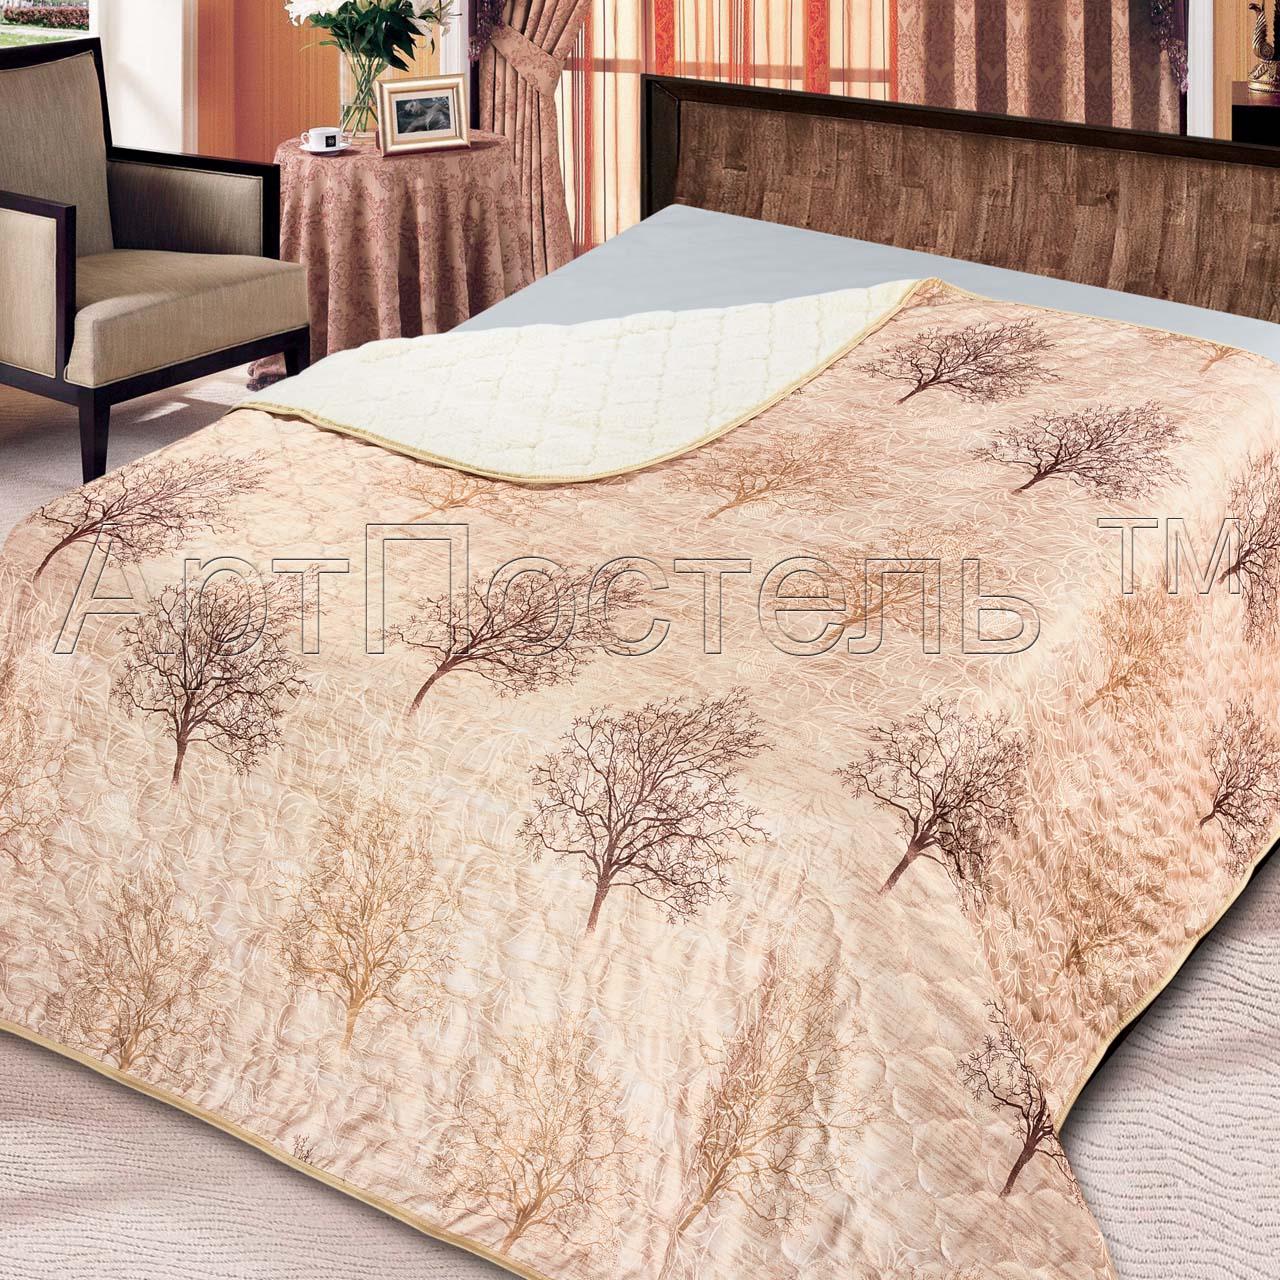 Покрывало  Вереск , размер 200х220 см - Текстиль для дома артикул: 12272